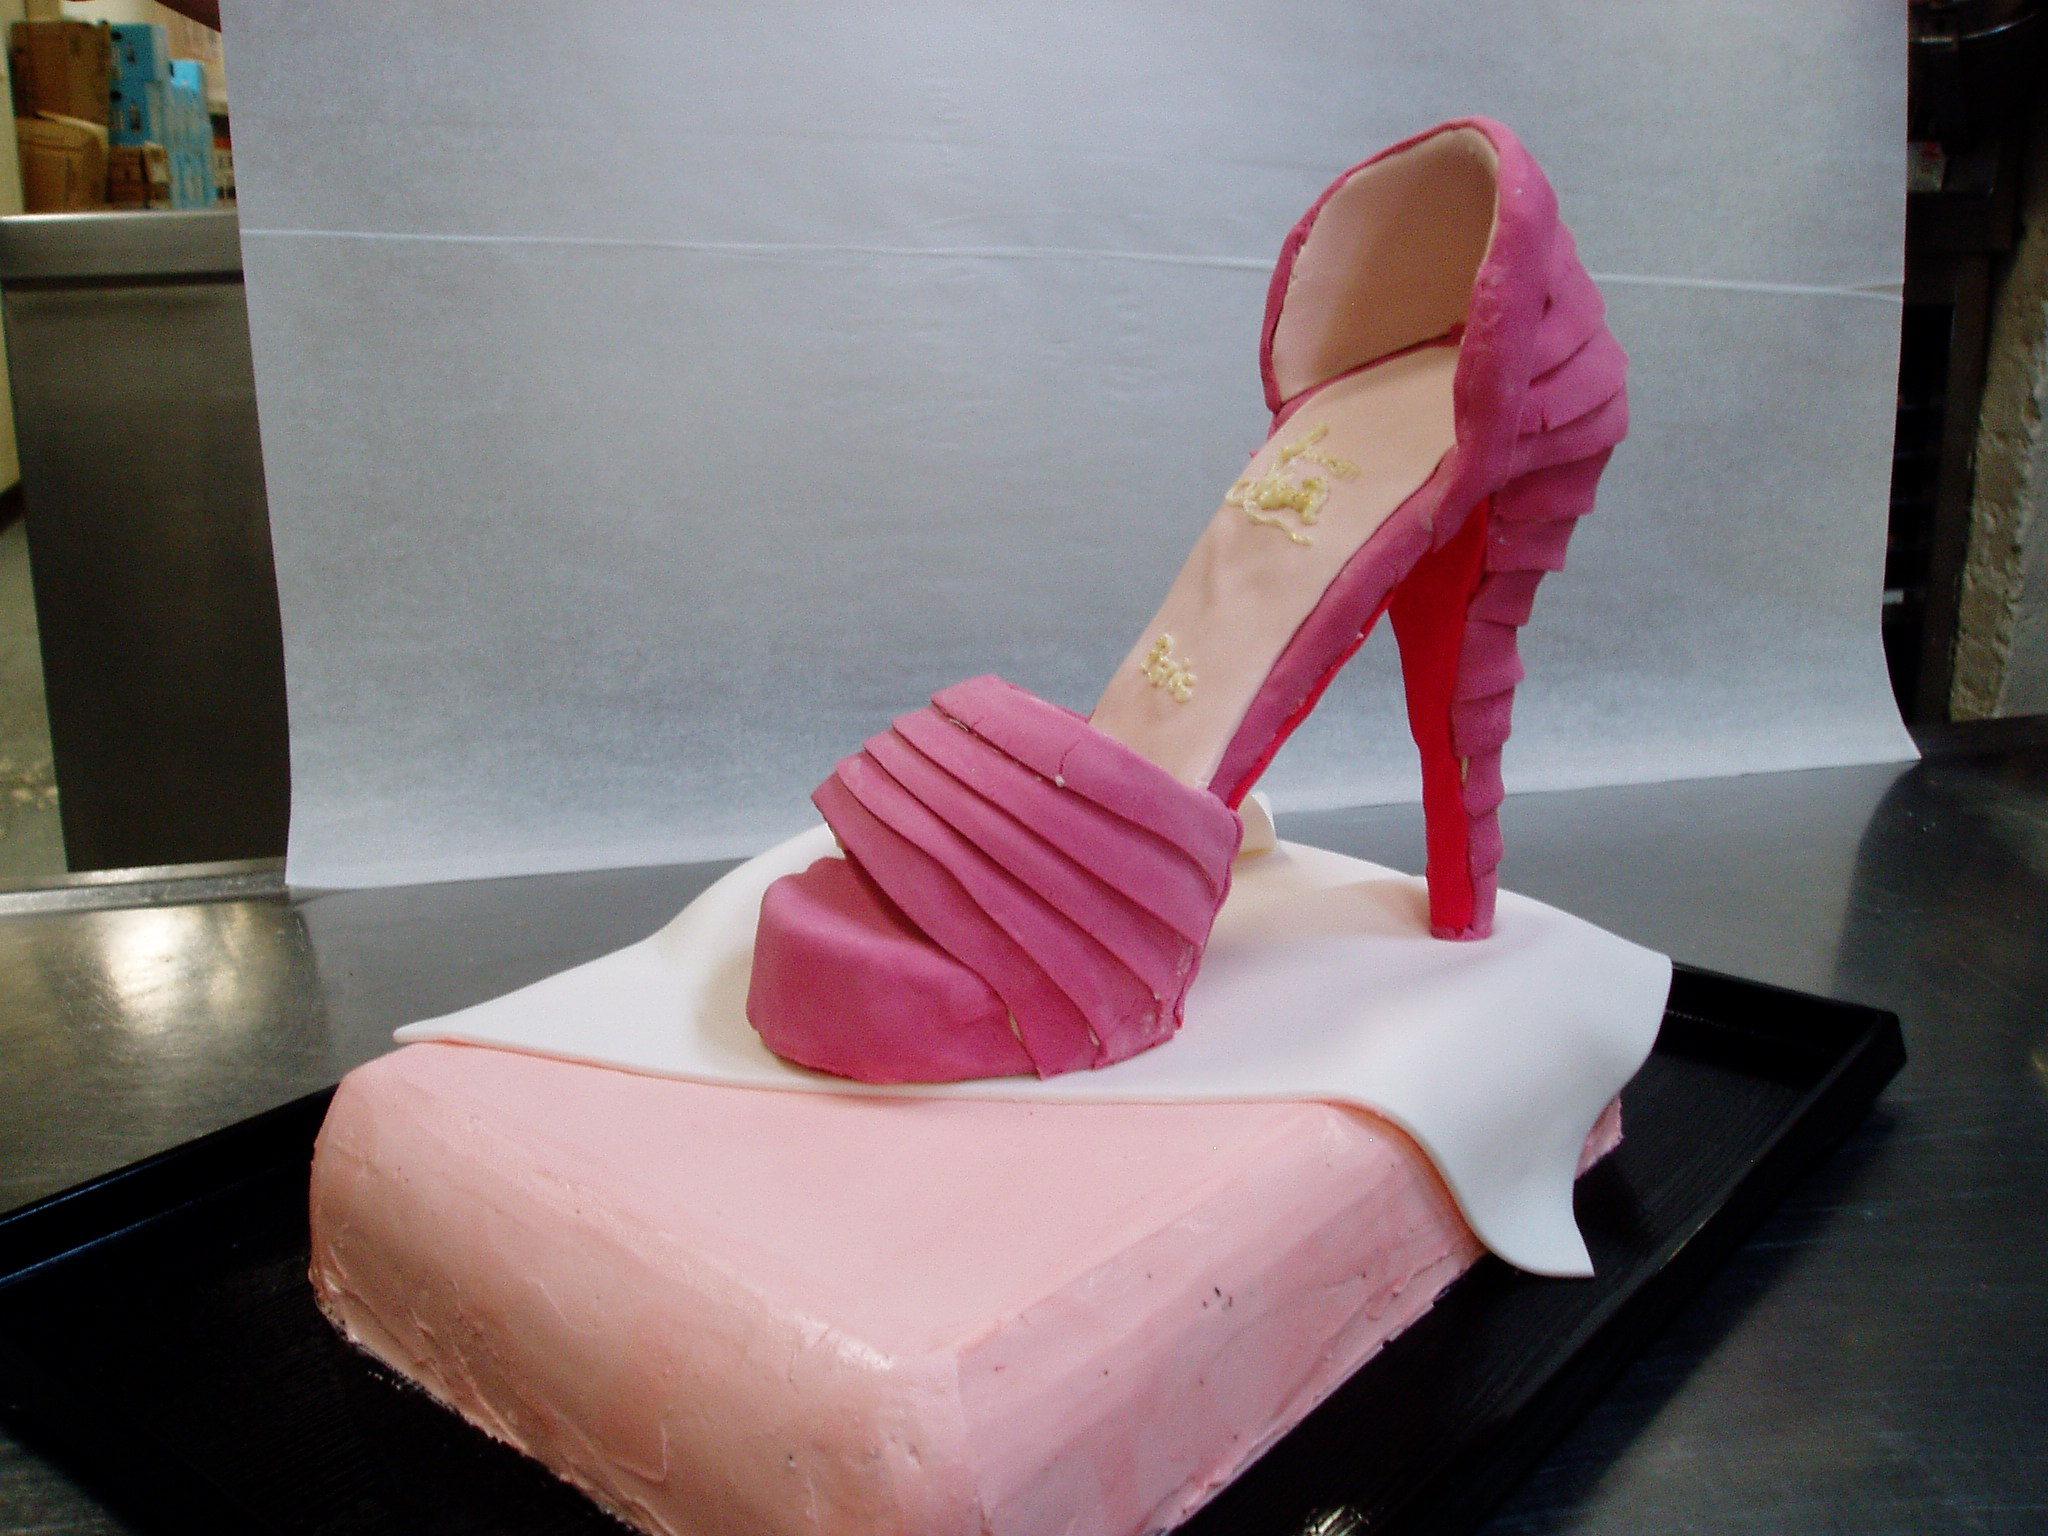 Cakes, cake, Bakery, Jersey city, Cocoa bakery bistro, Groom cake